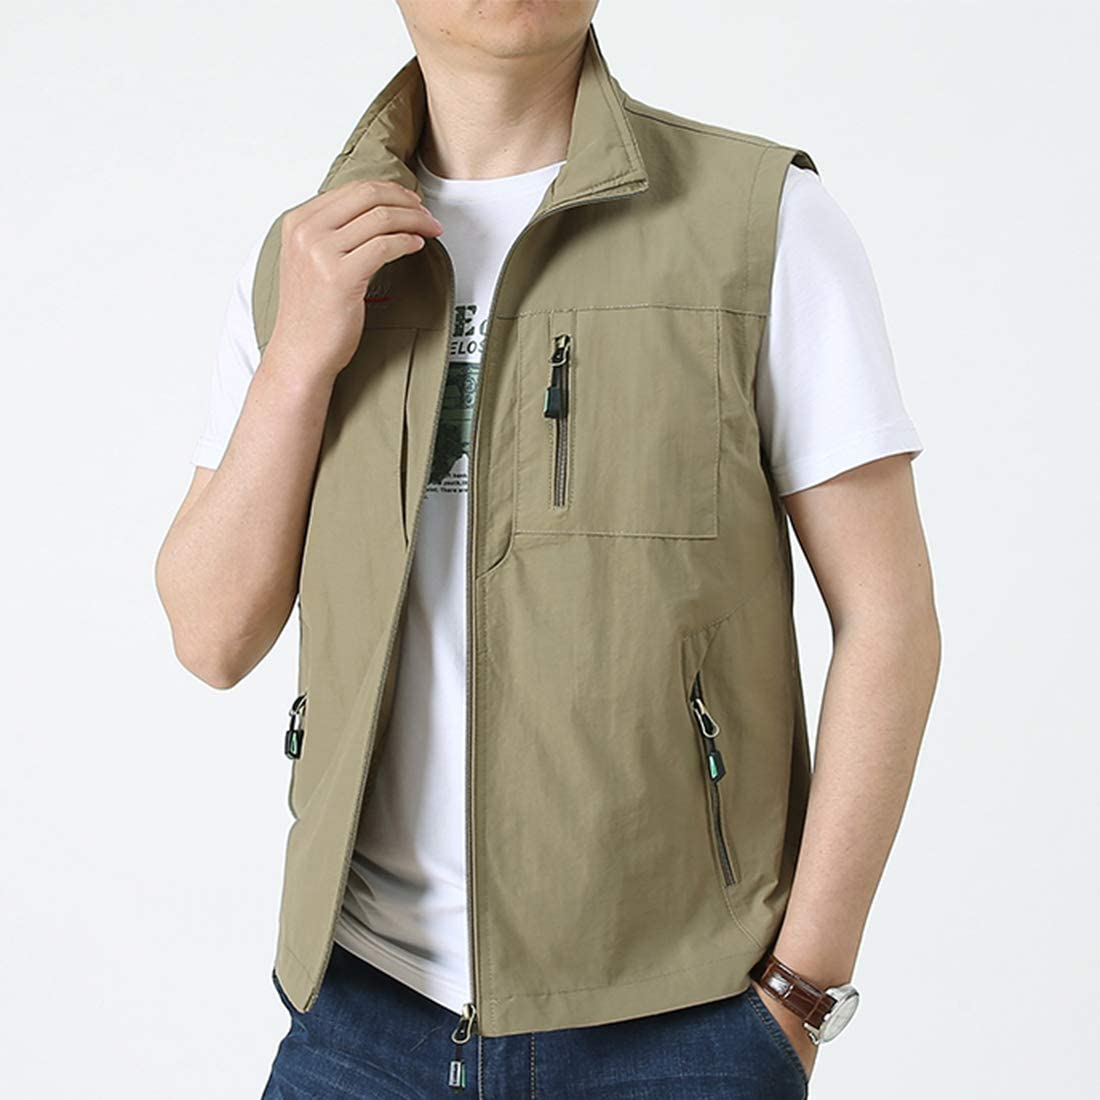 Panegy Herren Outdoor Weste Camping Vest Multi-Taschen Jacke Jagd Angeln Wandern wasserdichte Funktionsweste Farbe//Gr/ö/ße W/ählbar